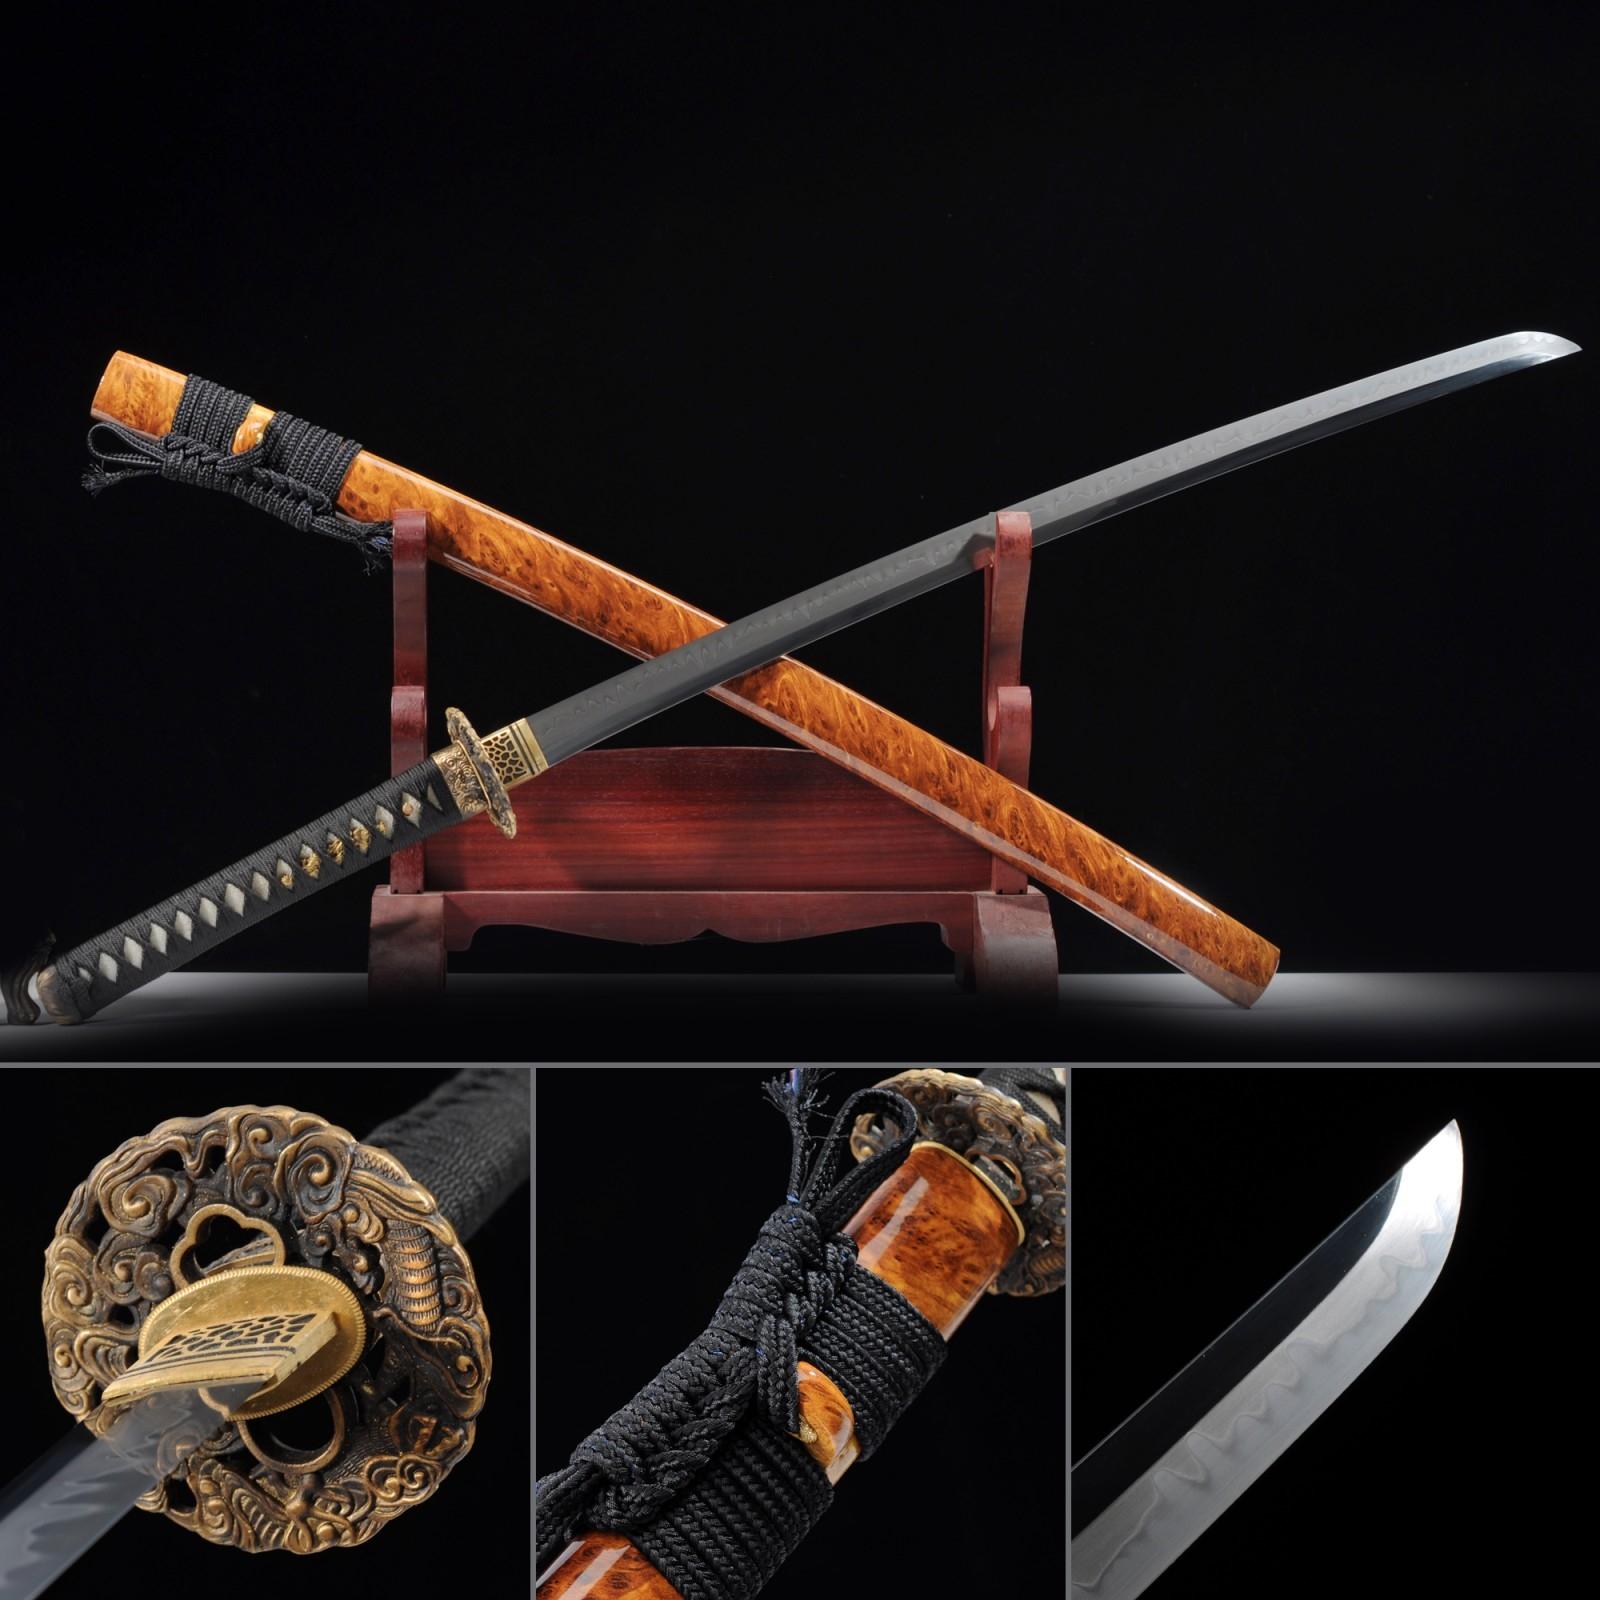 Hamon Katana, Japanese Katana Sword T10 Folded Clay Tempered Steel With Orange Scabbard